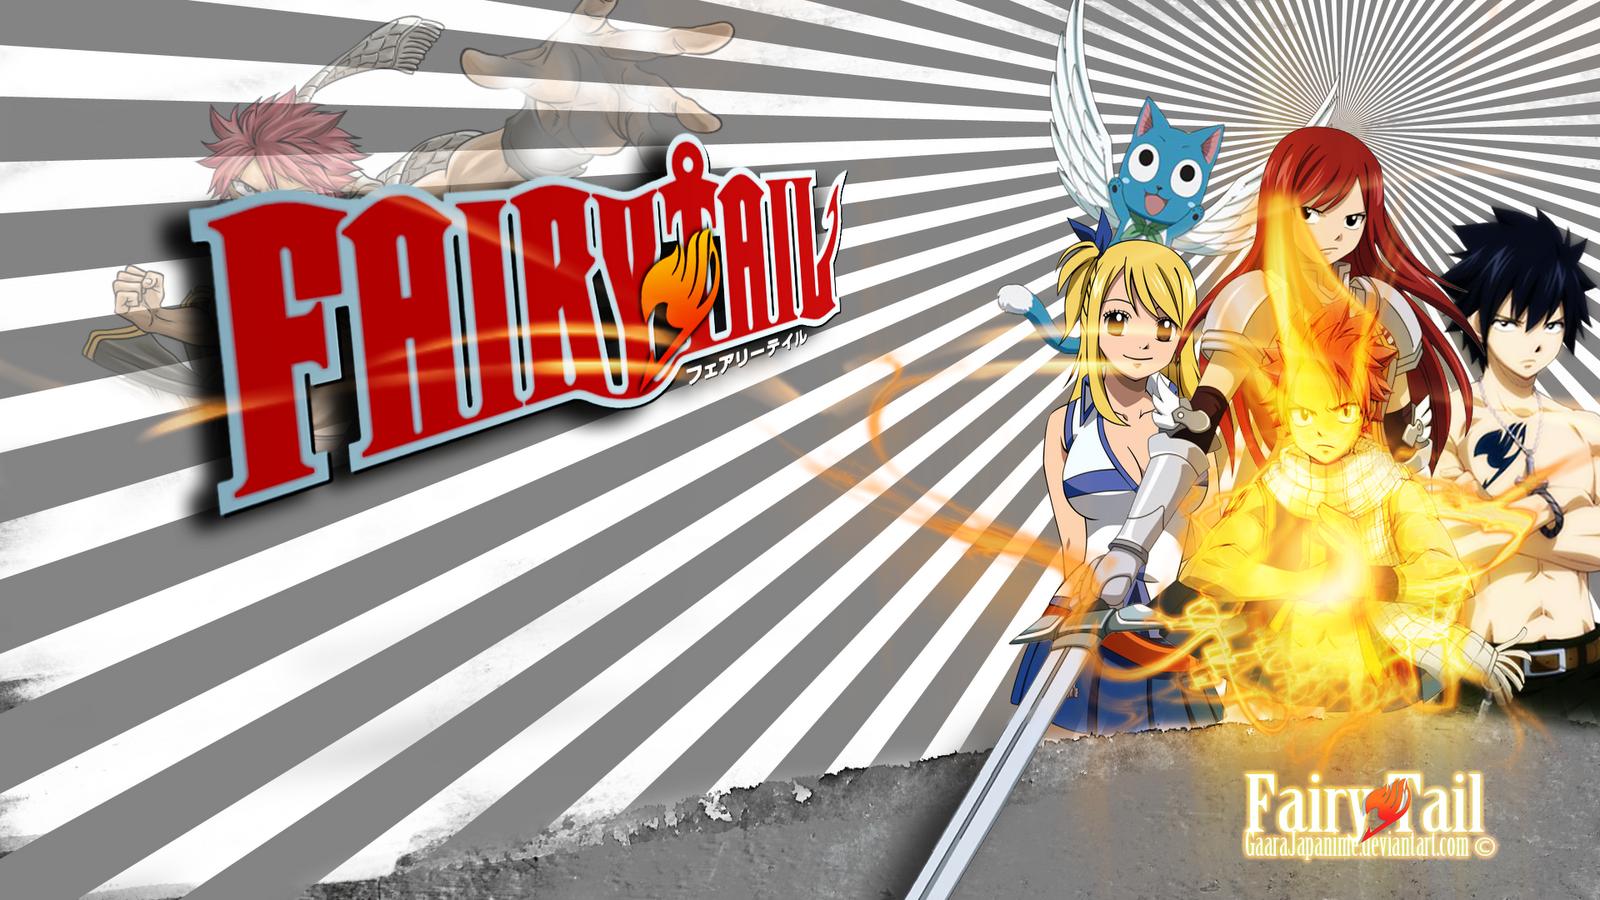 Fairy Tail Wallpapers - 21 Fondos de Pantalla HD